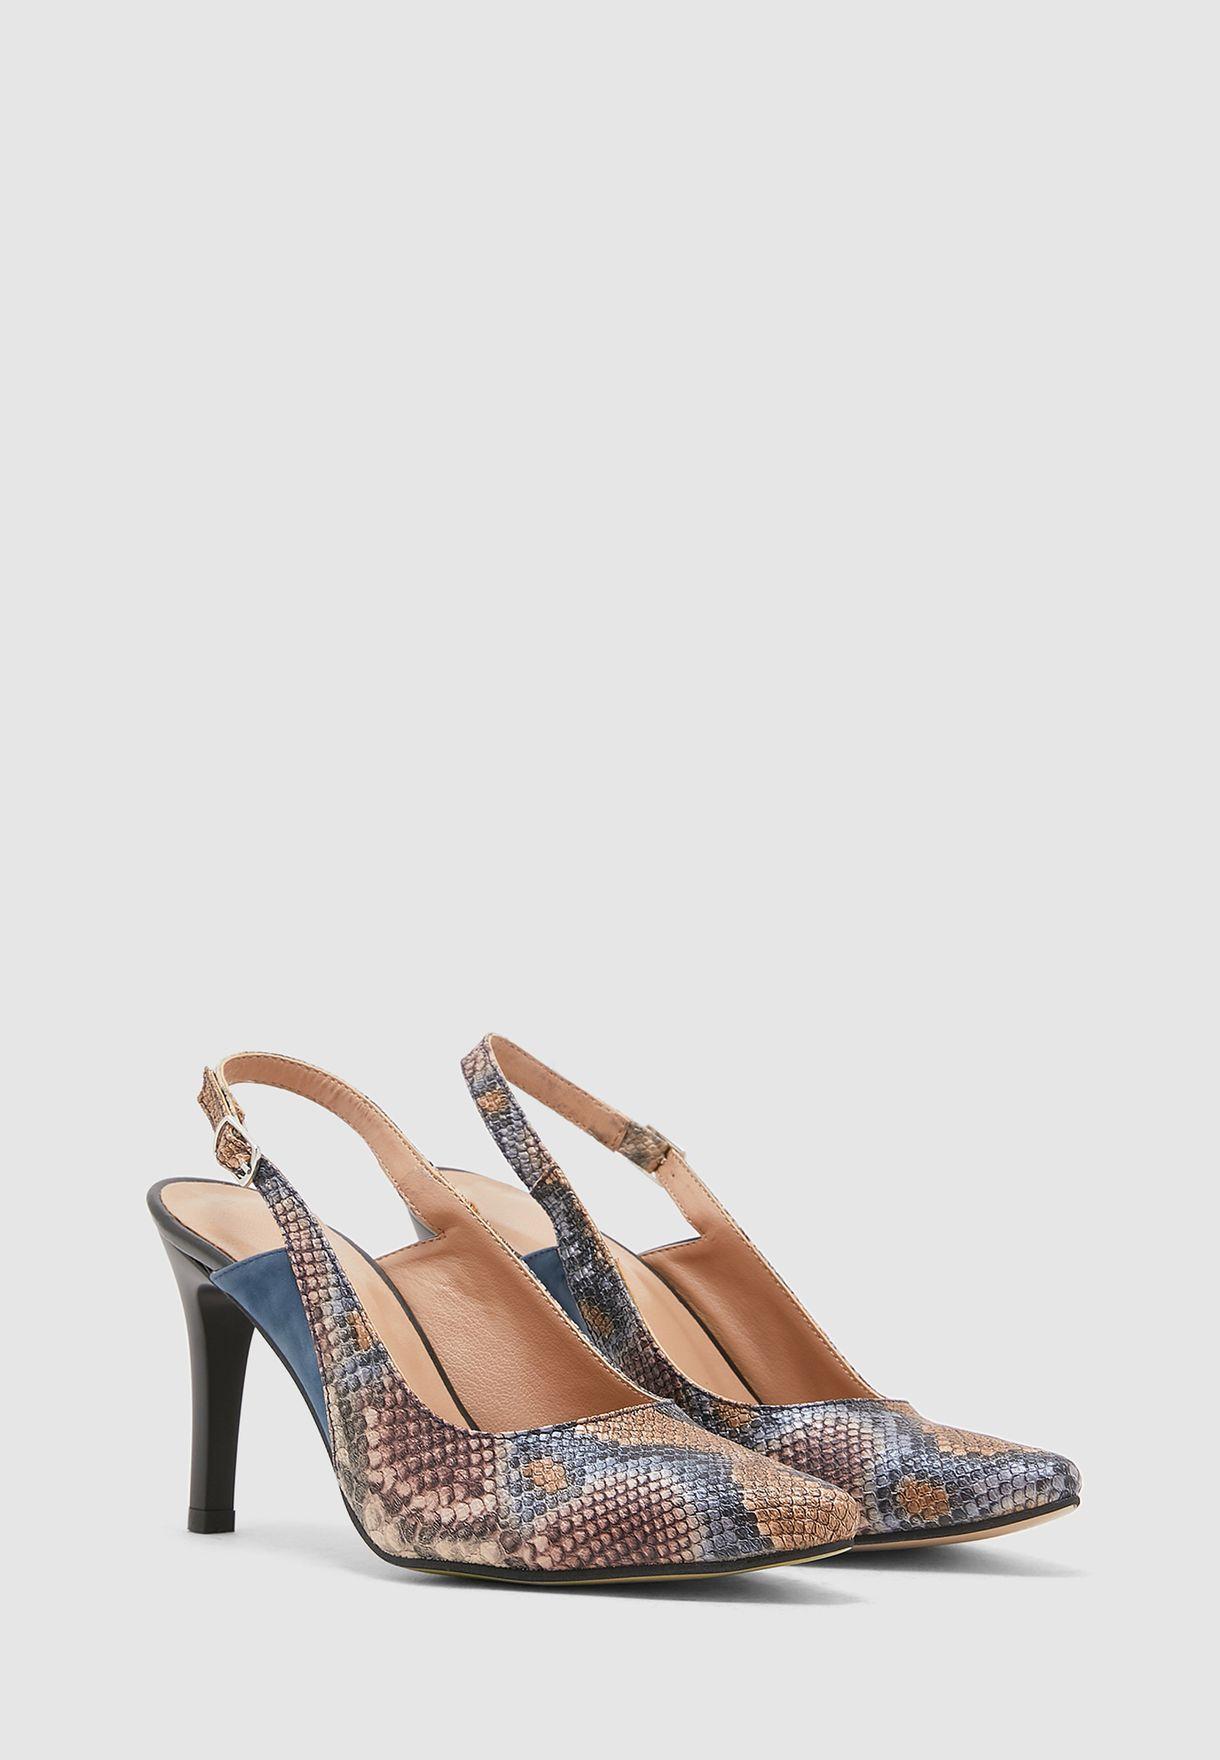 Ankle Strap Pump - Snakeskin